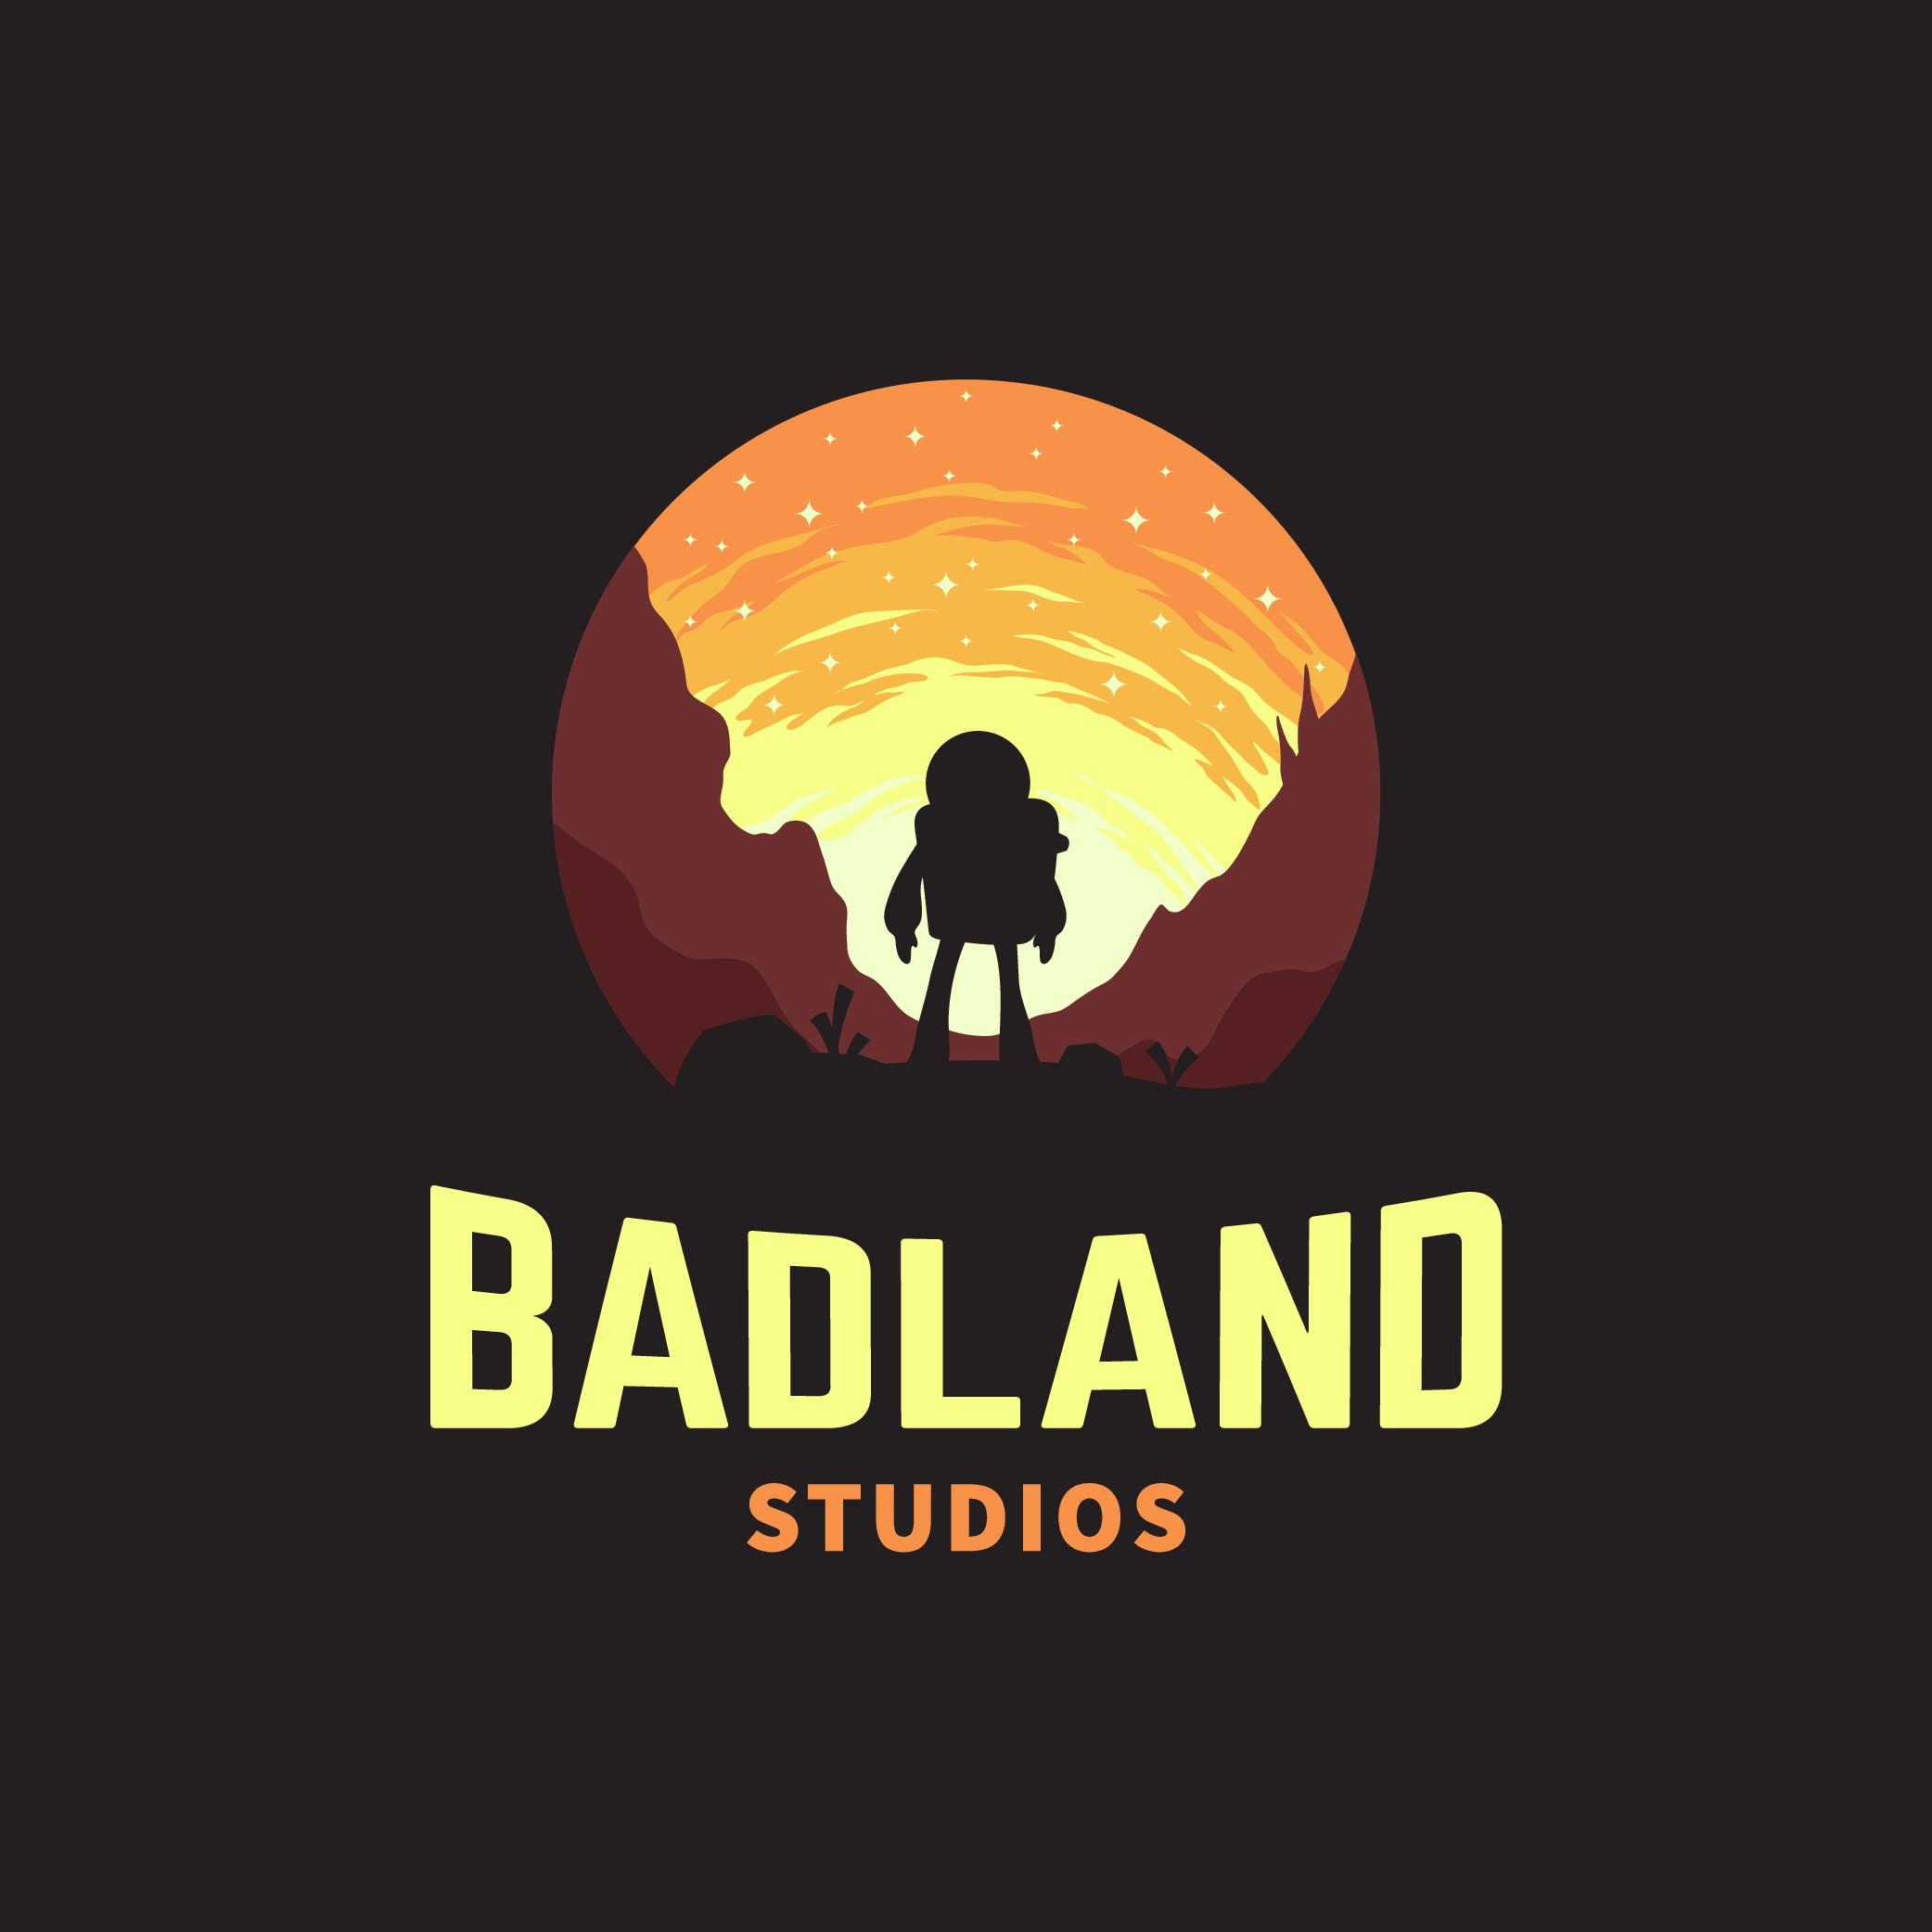 GAME ON! Design a logo for a Game Development Studio